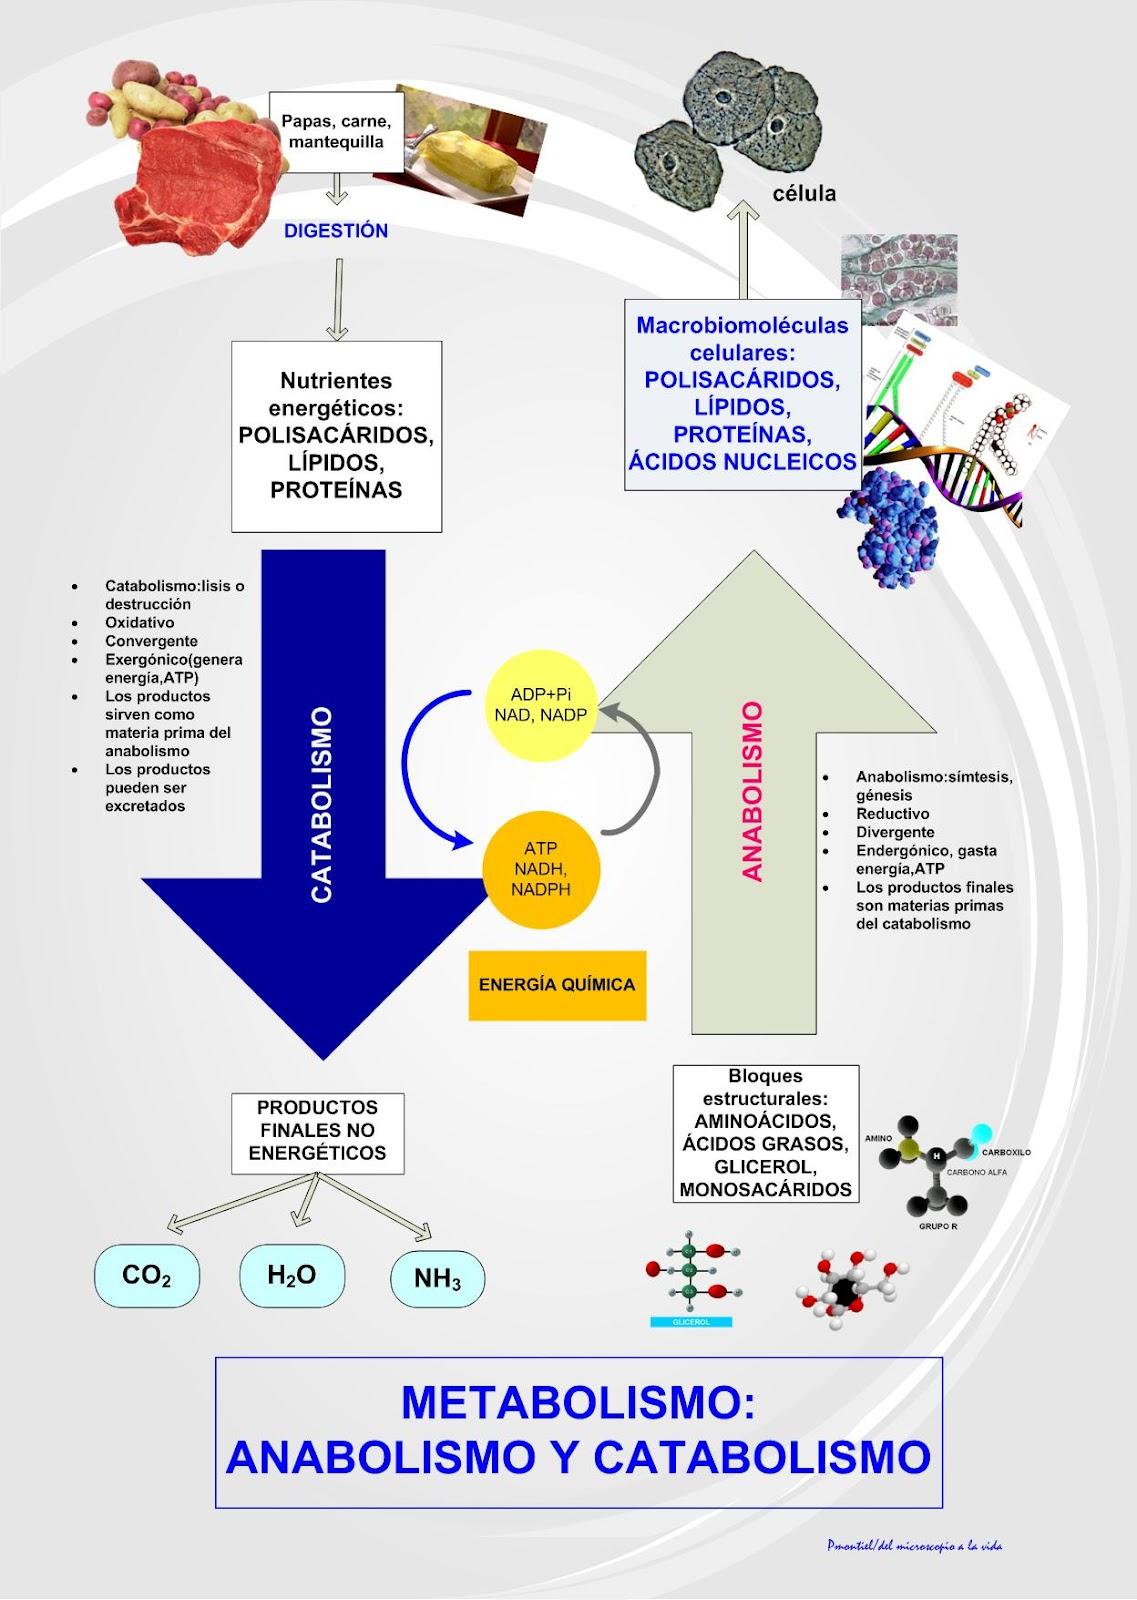 Catabolismo y anabolismo muscular